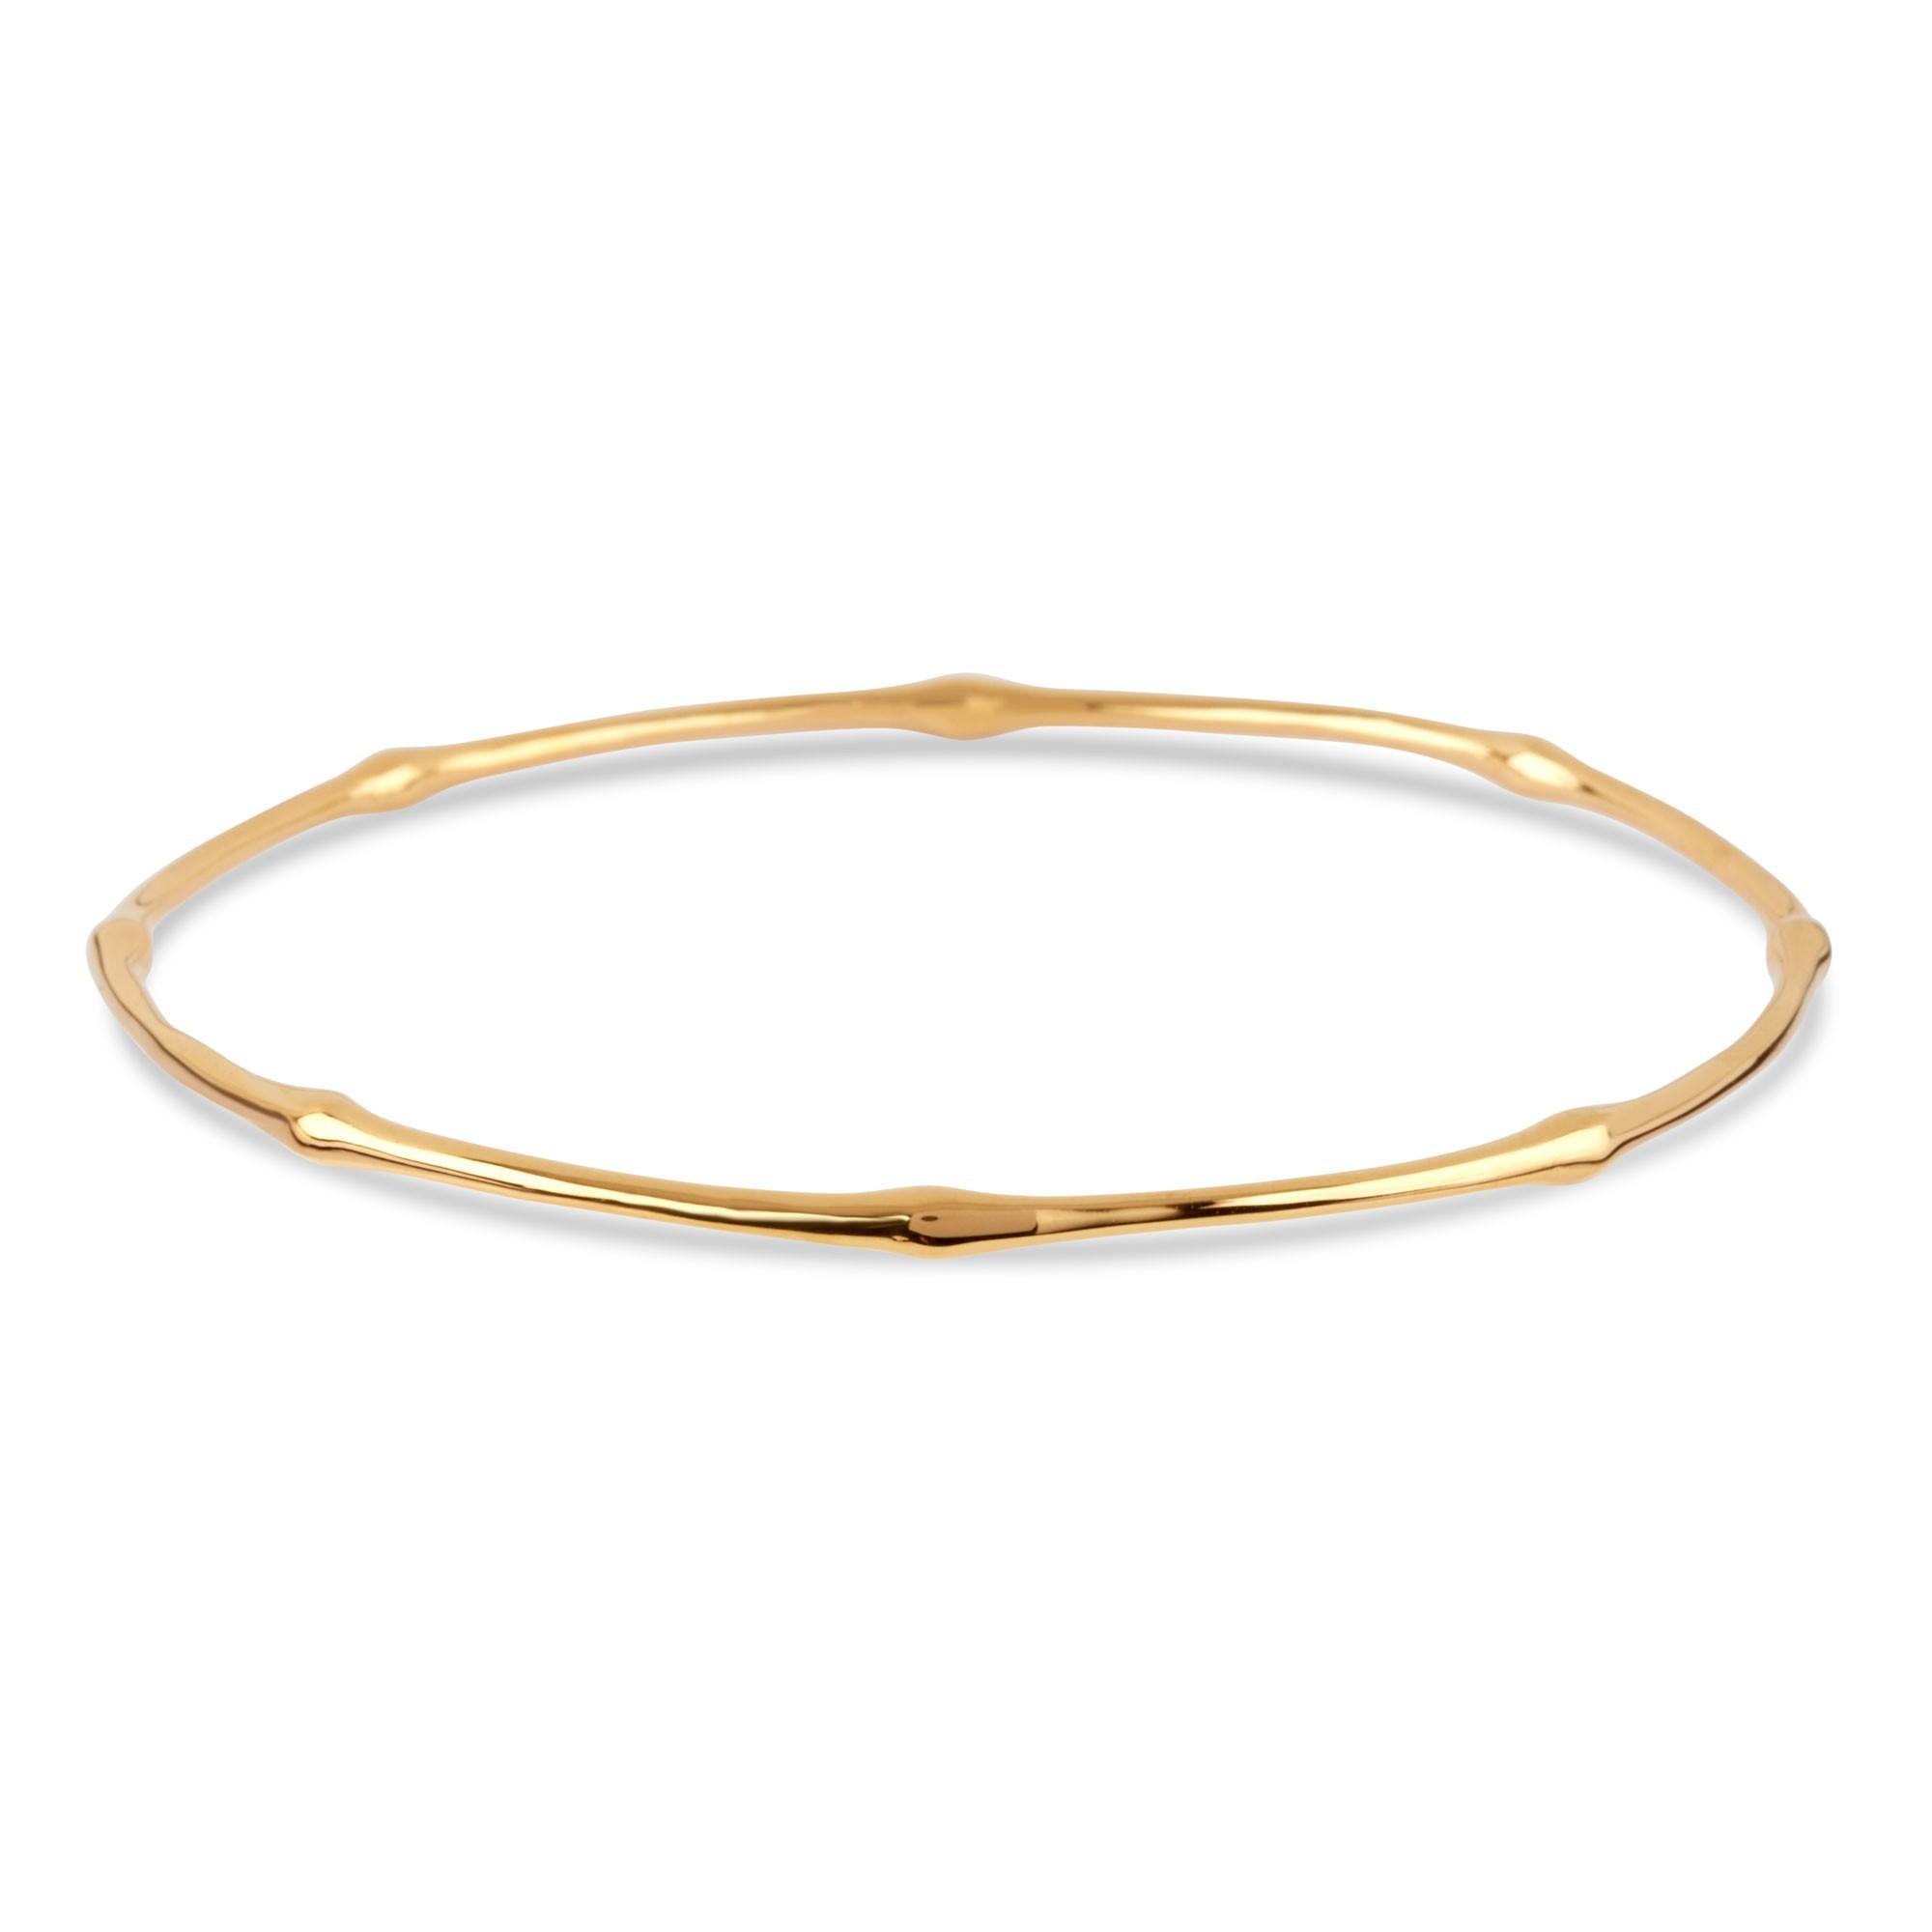 4abf32ac040 Women's Bracelets & Cuffs - Designer Brands - Harvey Nichols.